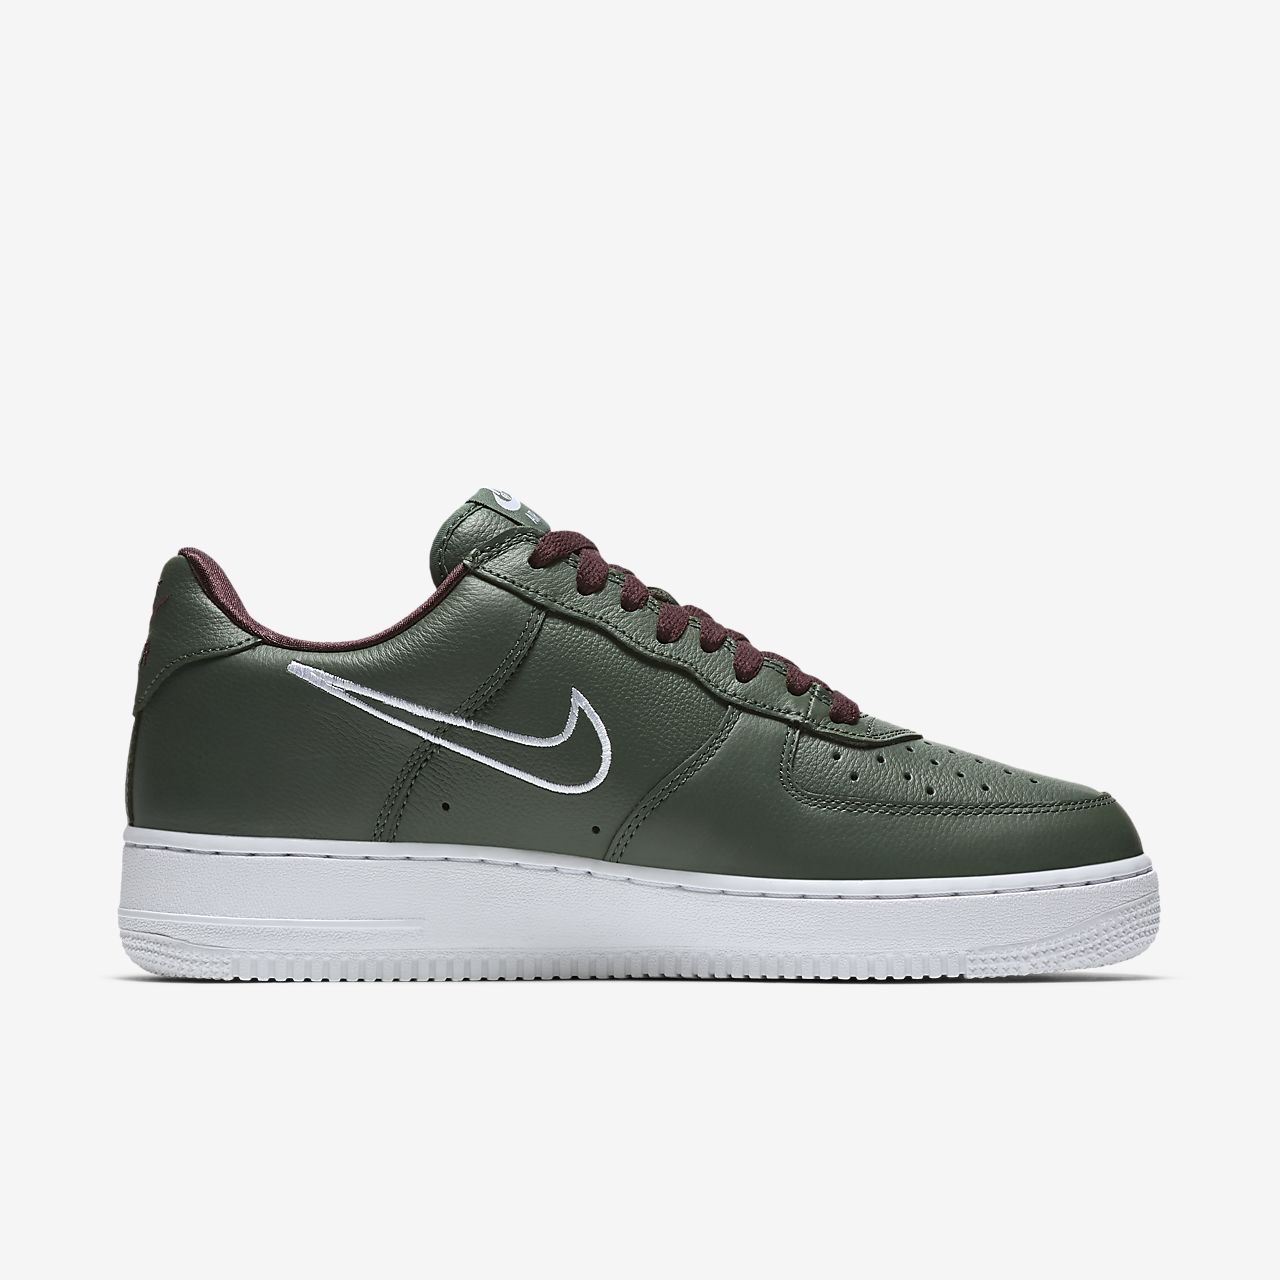 more photos c8ead a2524 Nike Air Force 1 Low Retro Mens Shoe ...